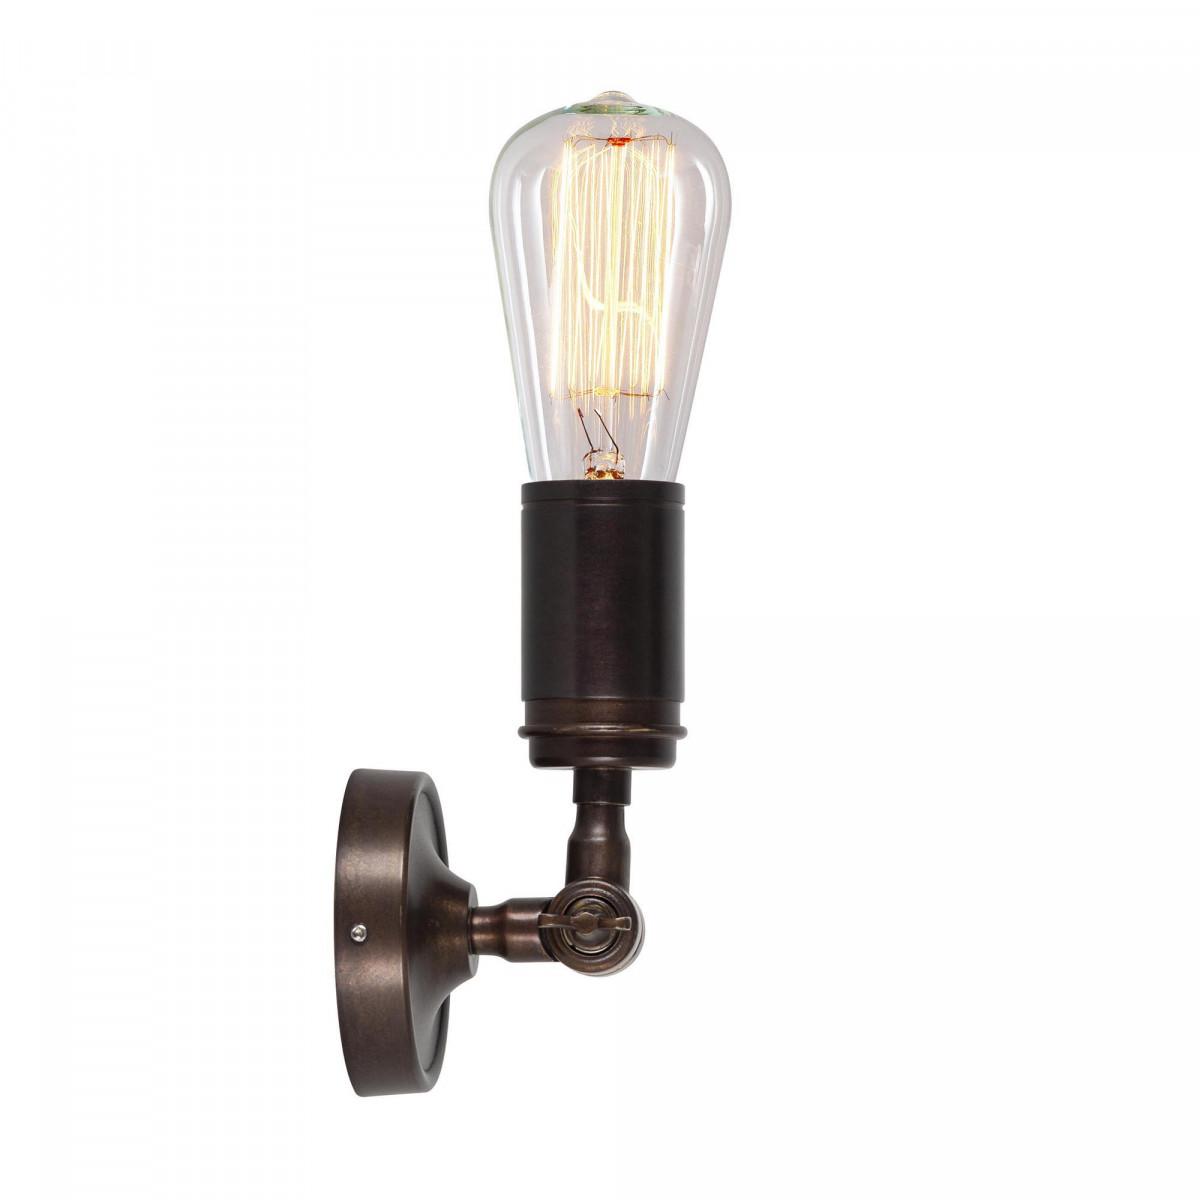 Plafondlamp Spot Emeli antiek brons